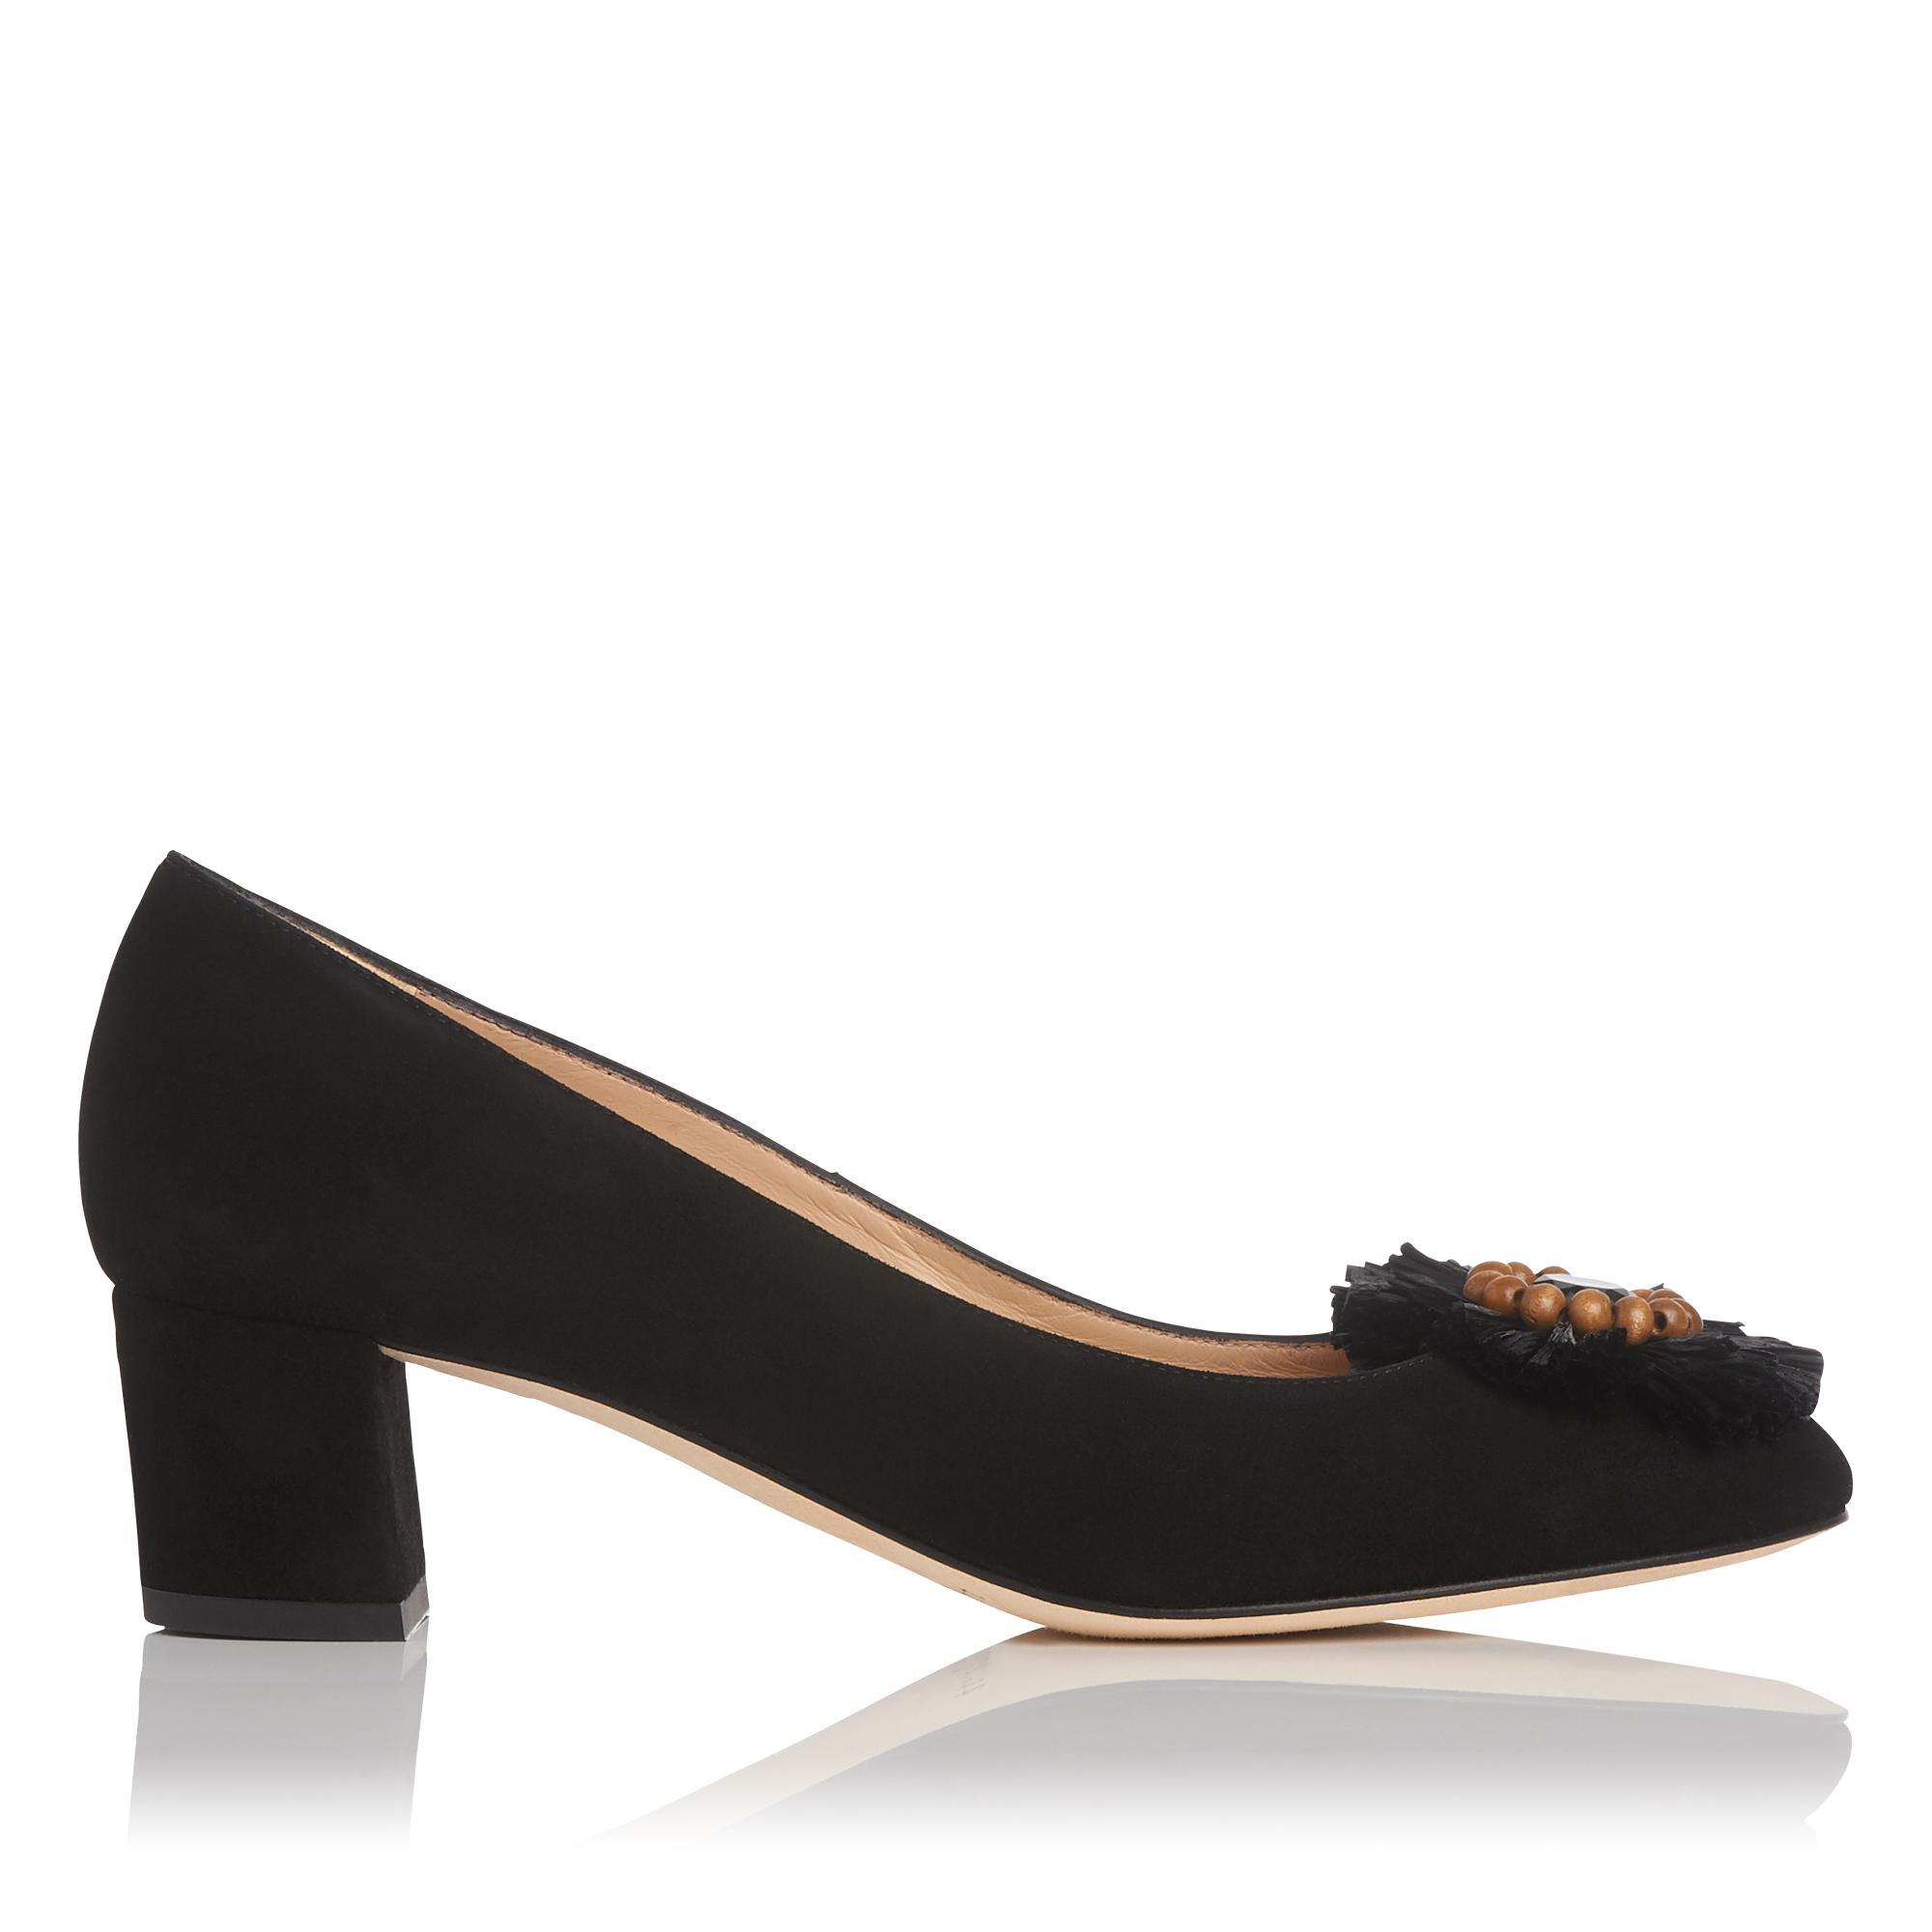 36dd3d0b9399 Abella Black Suede Block Heel